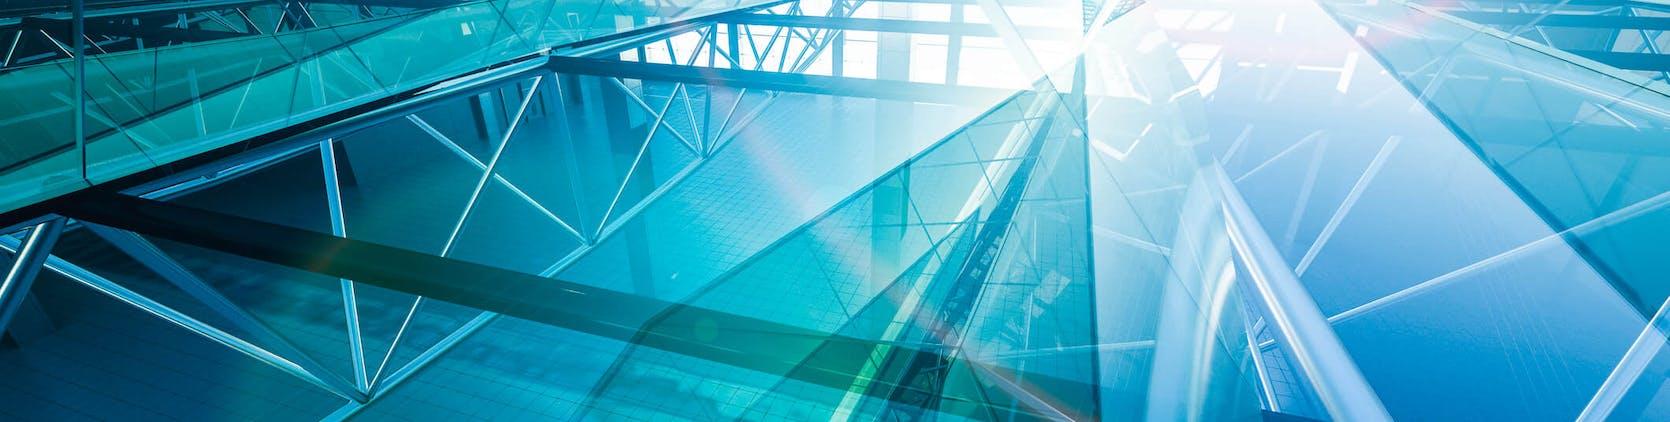 Blue windows on building, geometric patterns